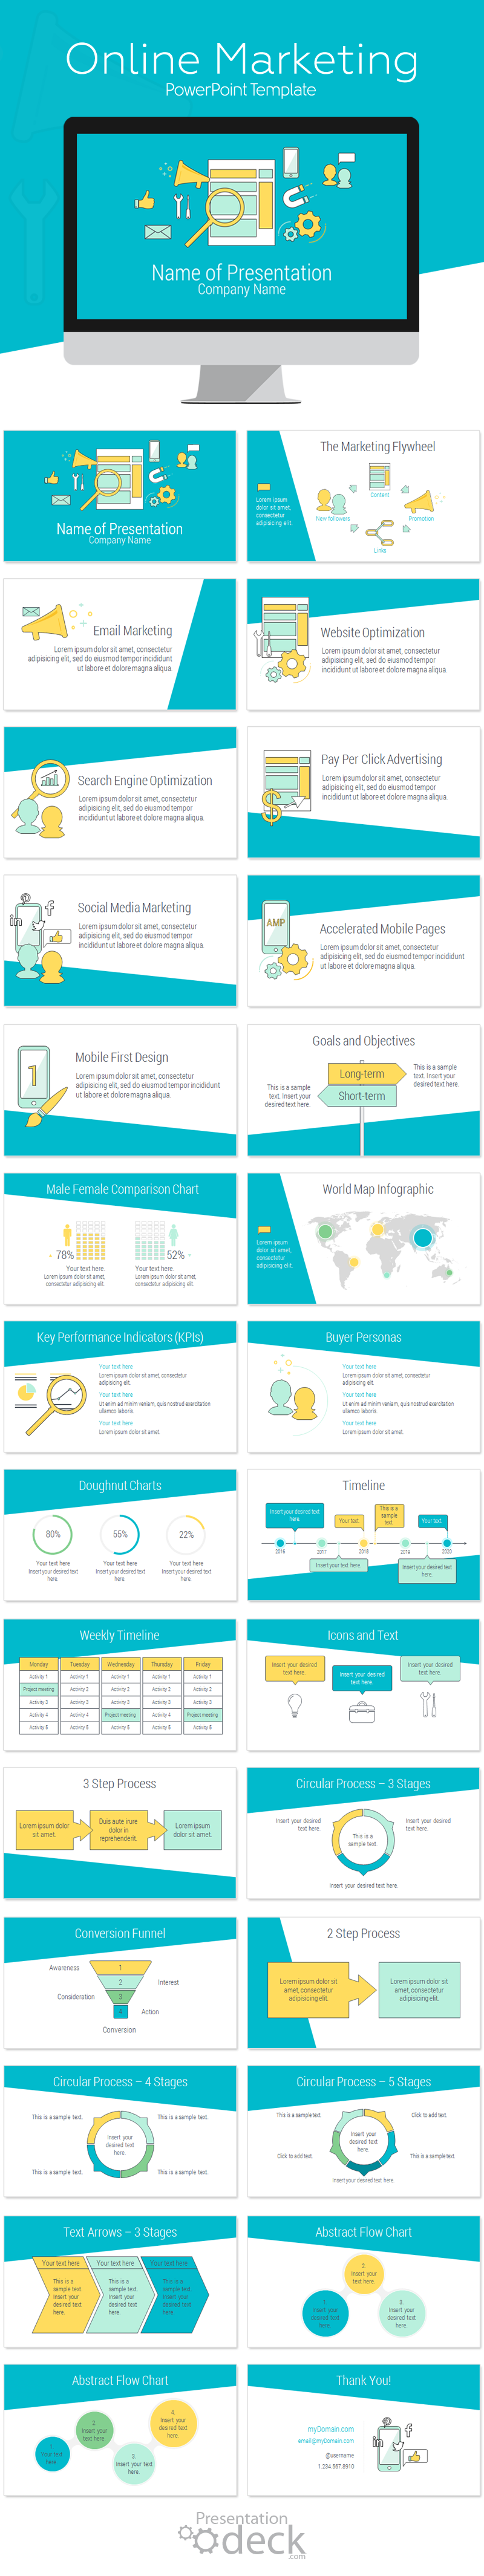 Online Marketing PowerPoint Template   Ppt Presentation